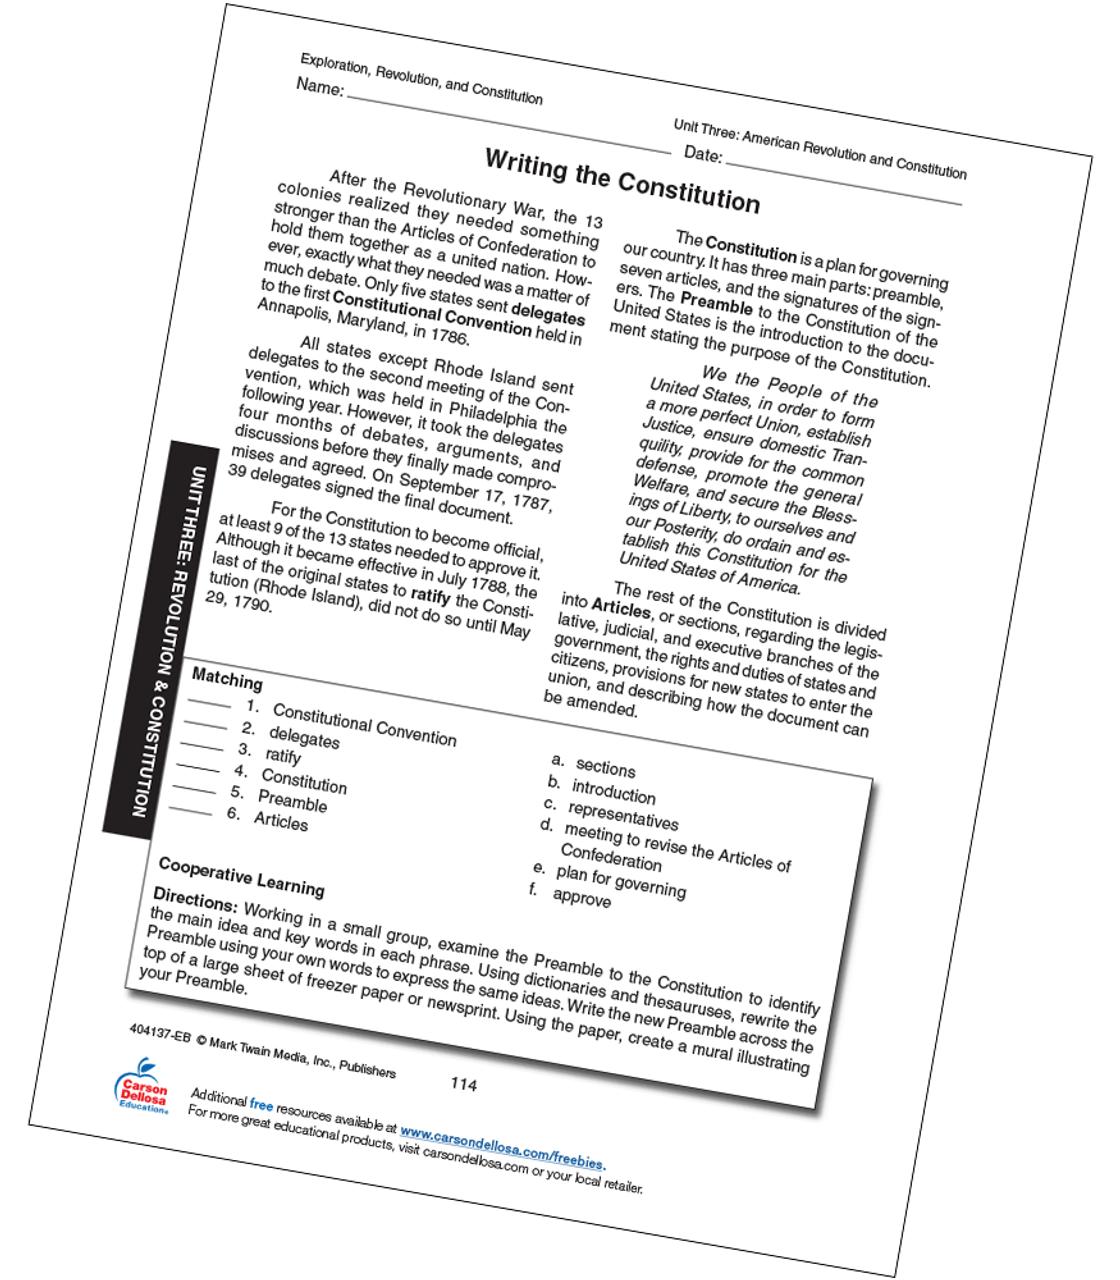 Writing the Constitution Grades 6-12 Free Printable   Carson Dellosa [ 1280 x 1120 Pixel ]